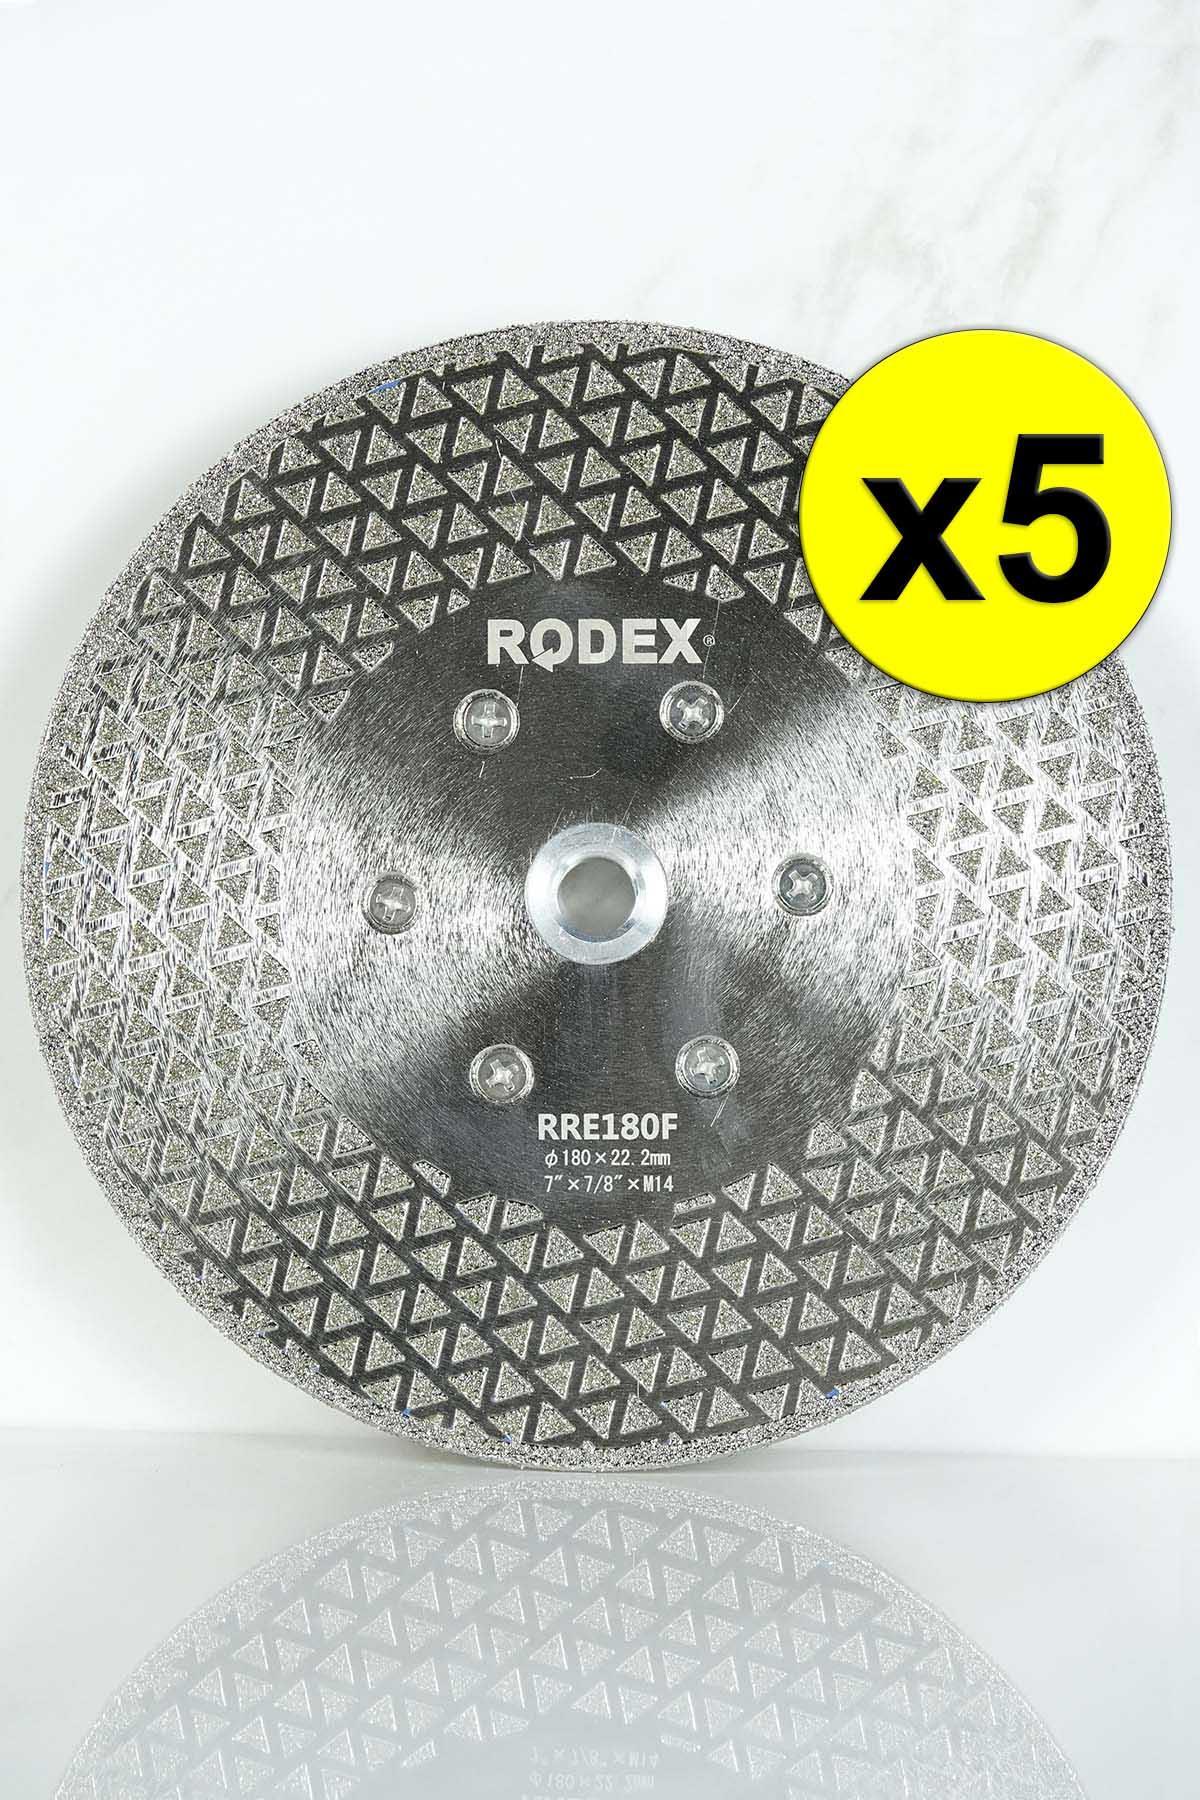 Rodex RRE180F Flanged Diamond Saw Blade for Marble, Granite, Porcelain 180mm 5 Pcs